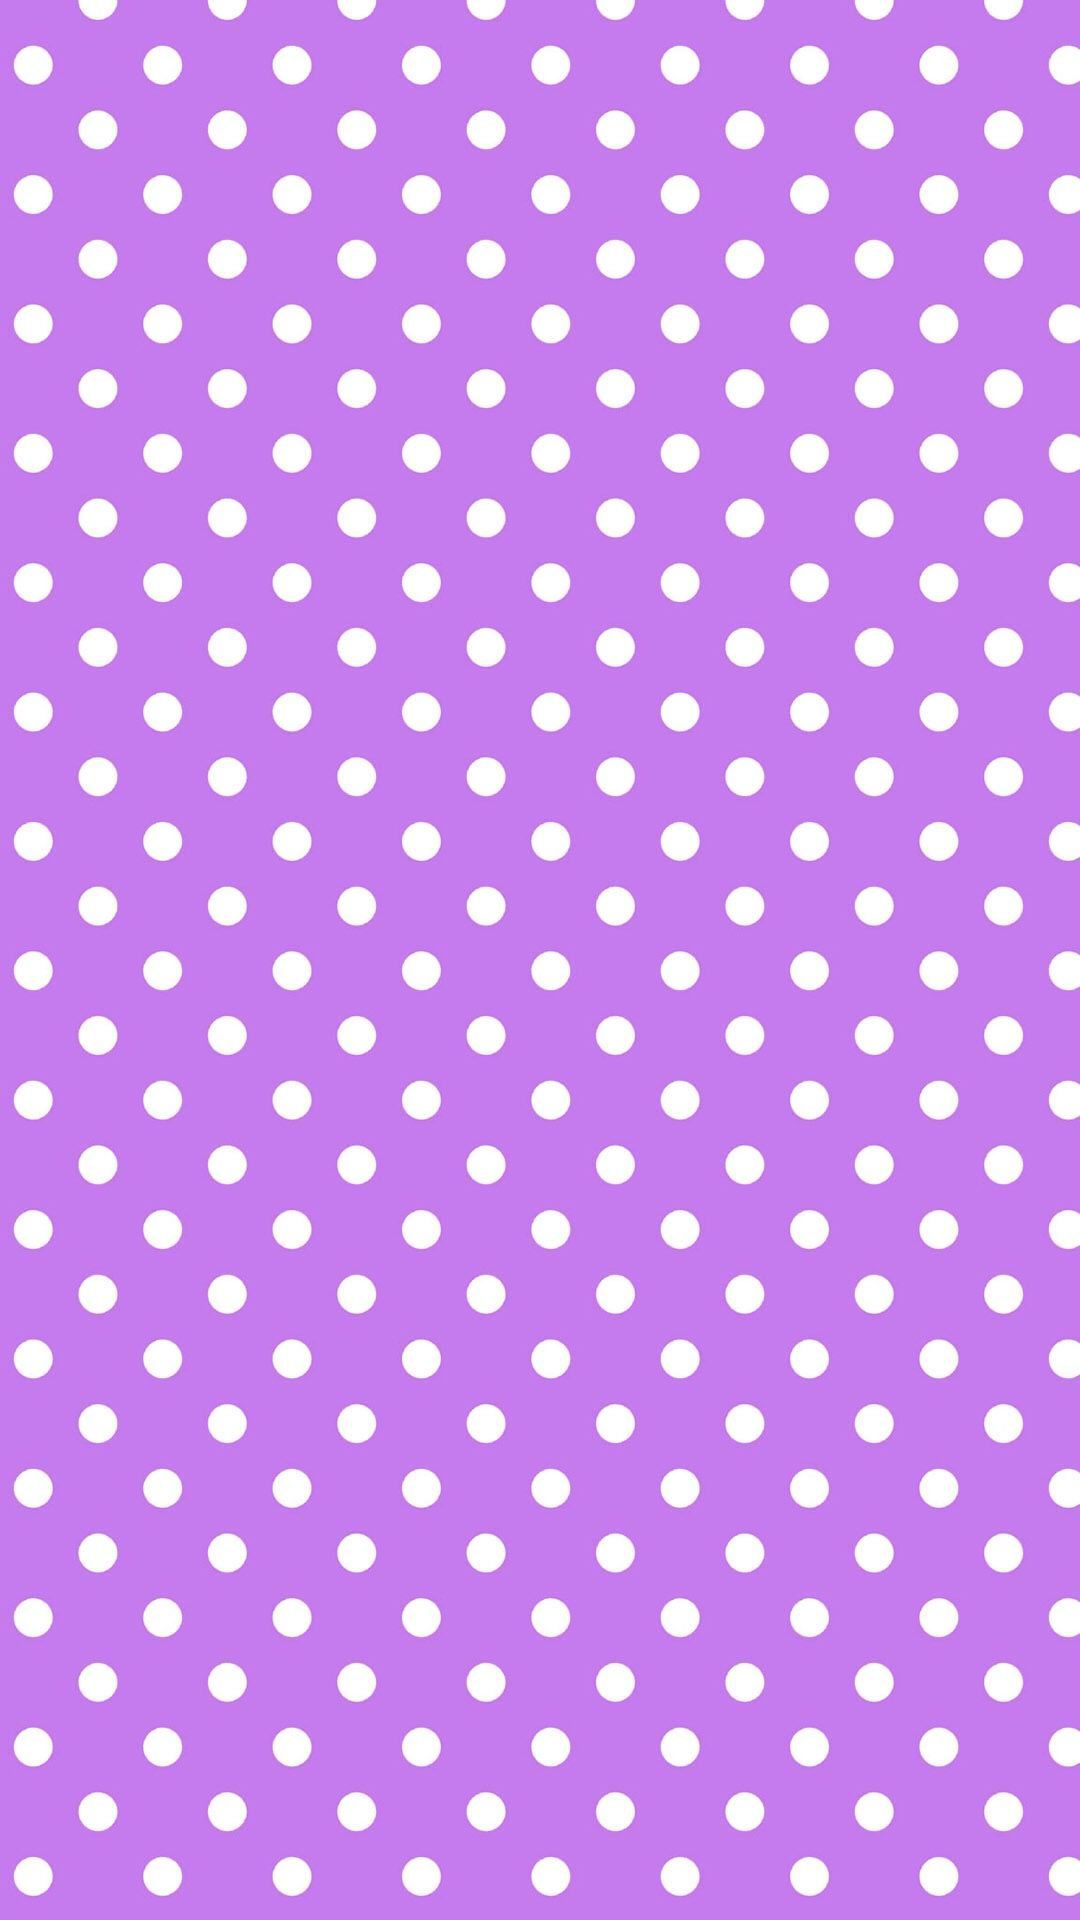 Pin by HoneyBeeXoxo on Stripes/Polka Dots   Purple ...